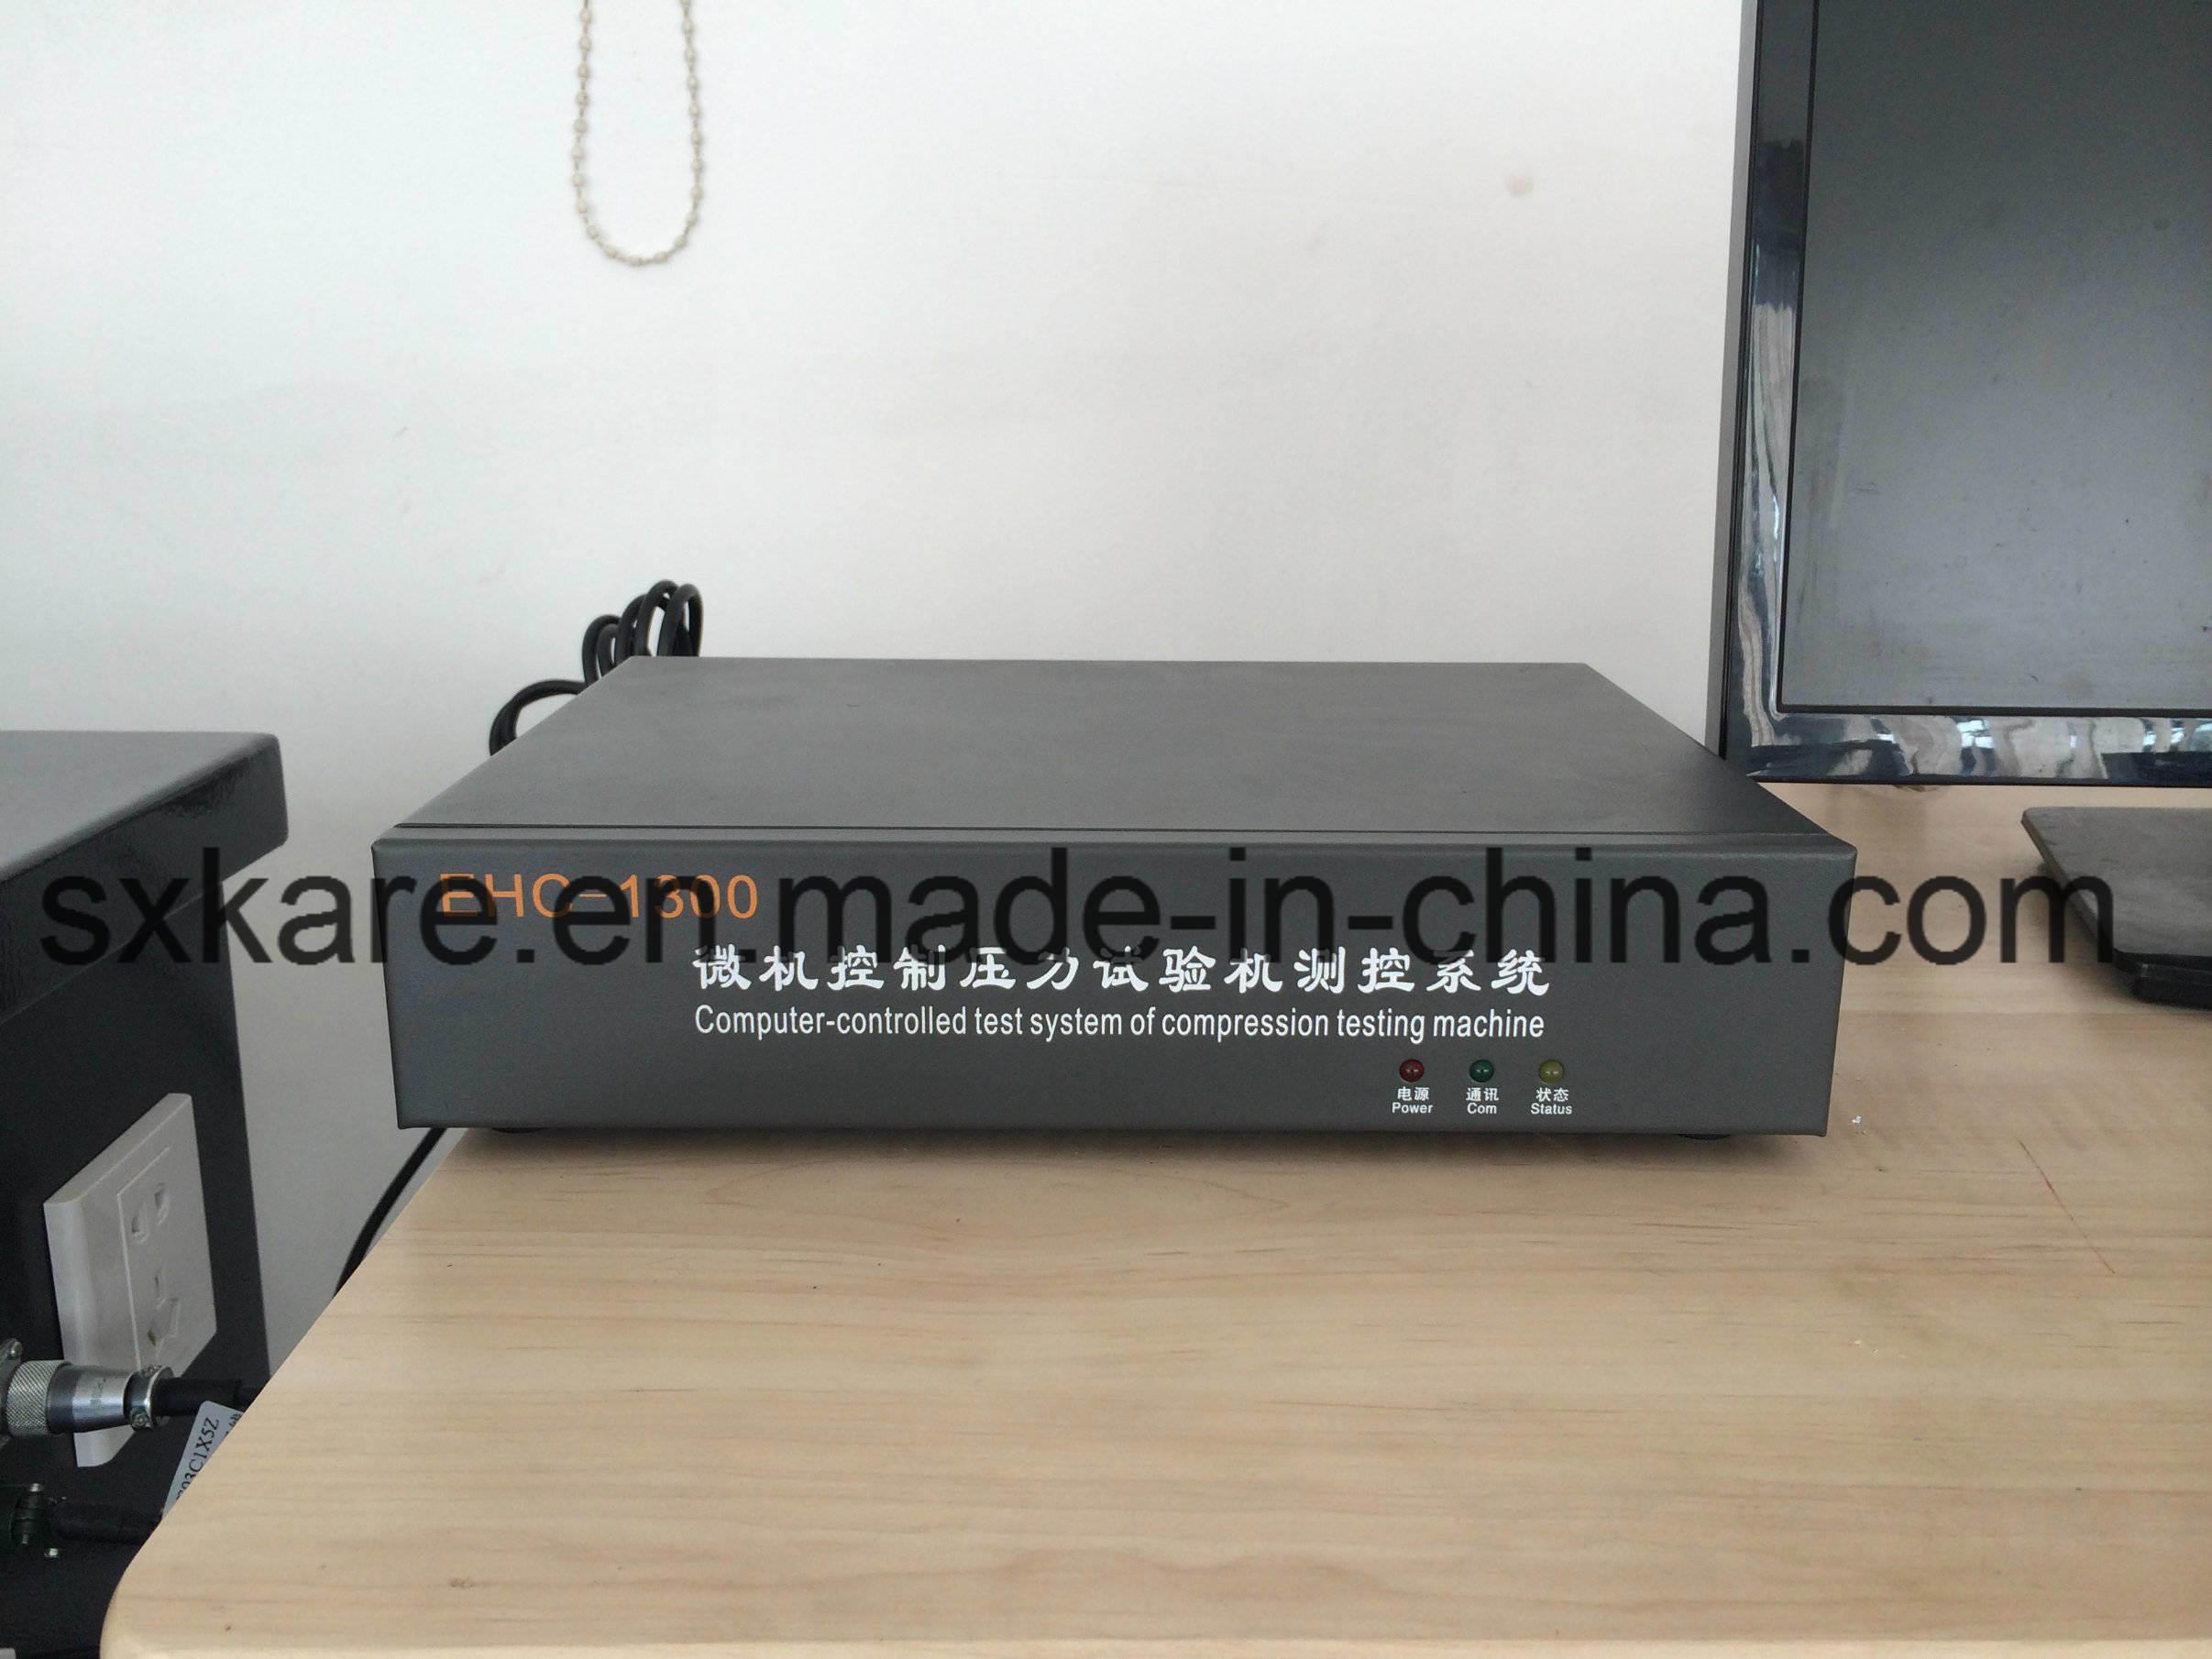 Electro-Hydraulic Servo Constant Loading Rate Compression Testing Machine (YAW-300)